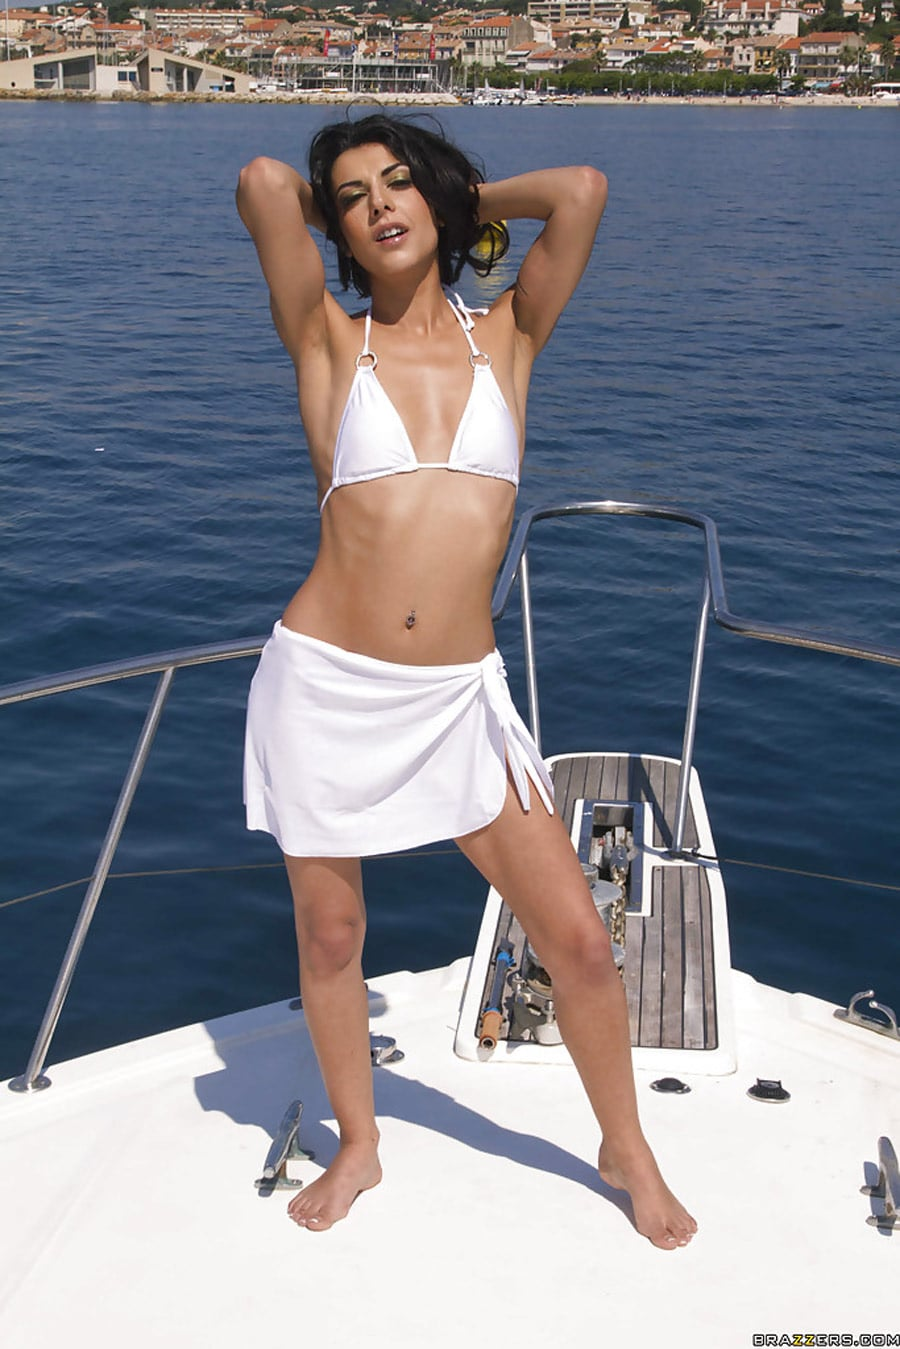 lou-charmelle-liza-del-sierra-partouze-yacht-brazzers-zz-series-1